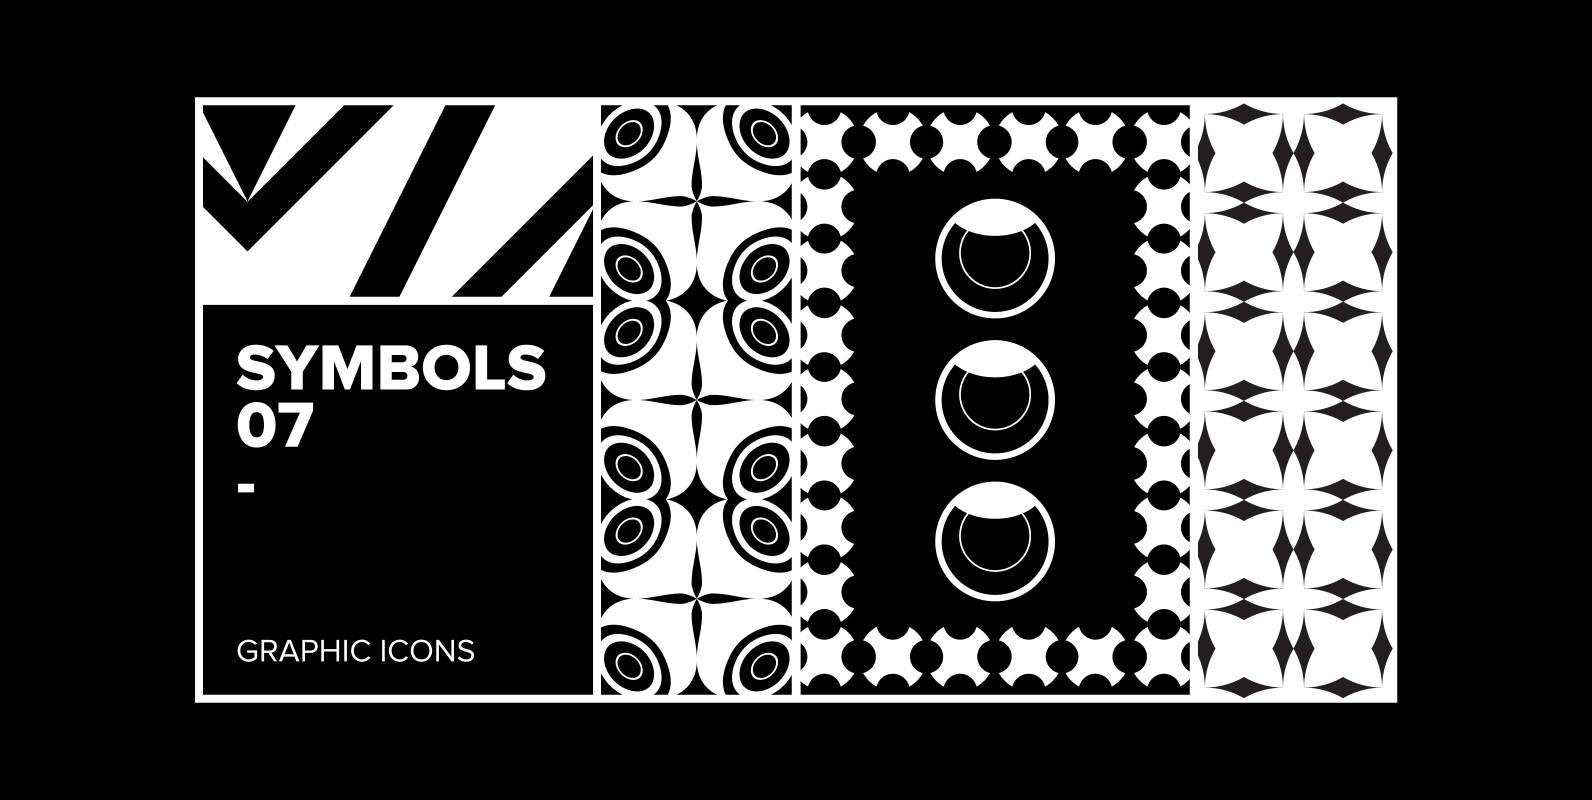 Symbols 07